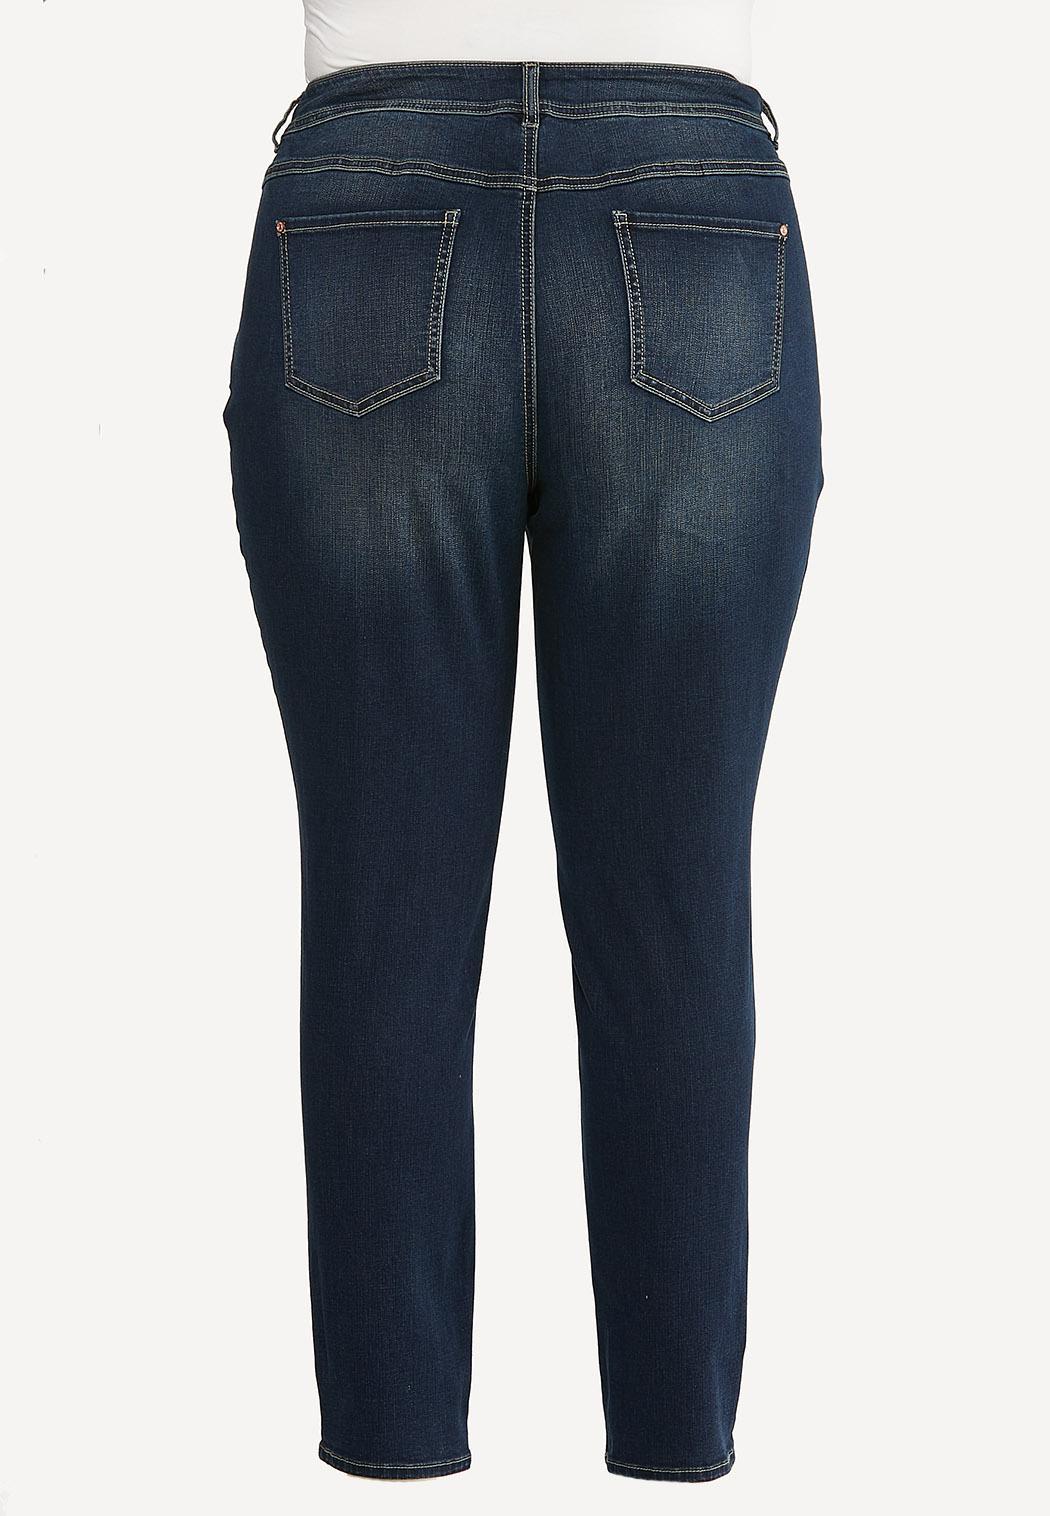 Plus Petite Shape Enhancing Skinny Jeans (Item #44645798)